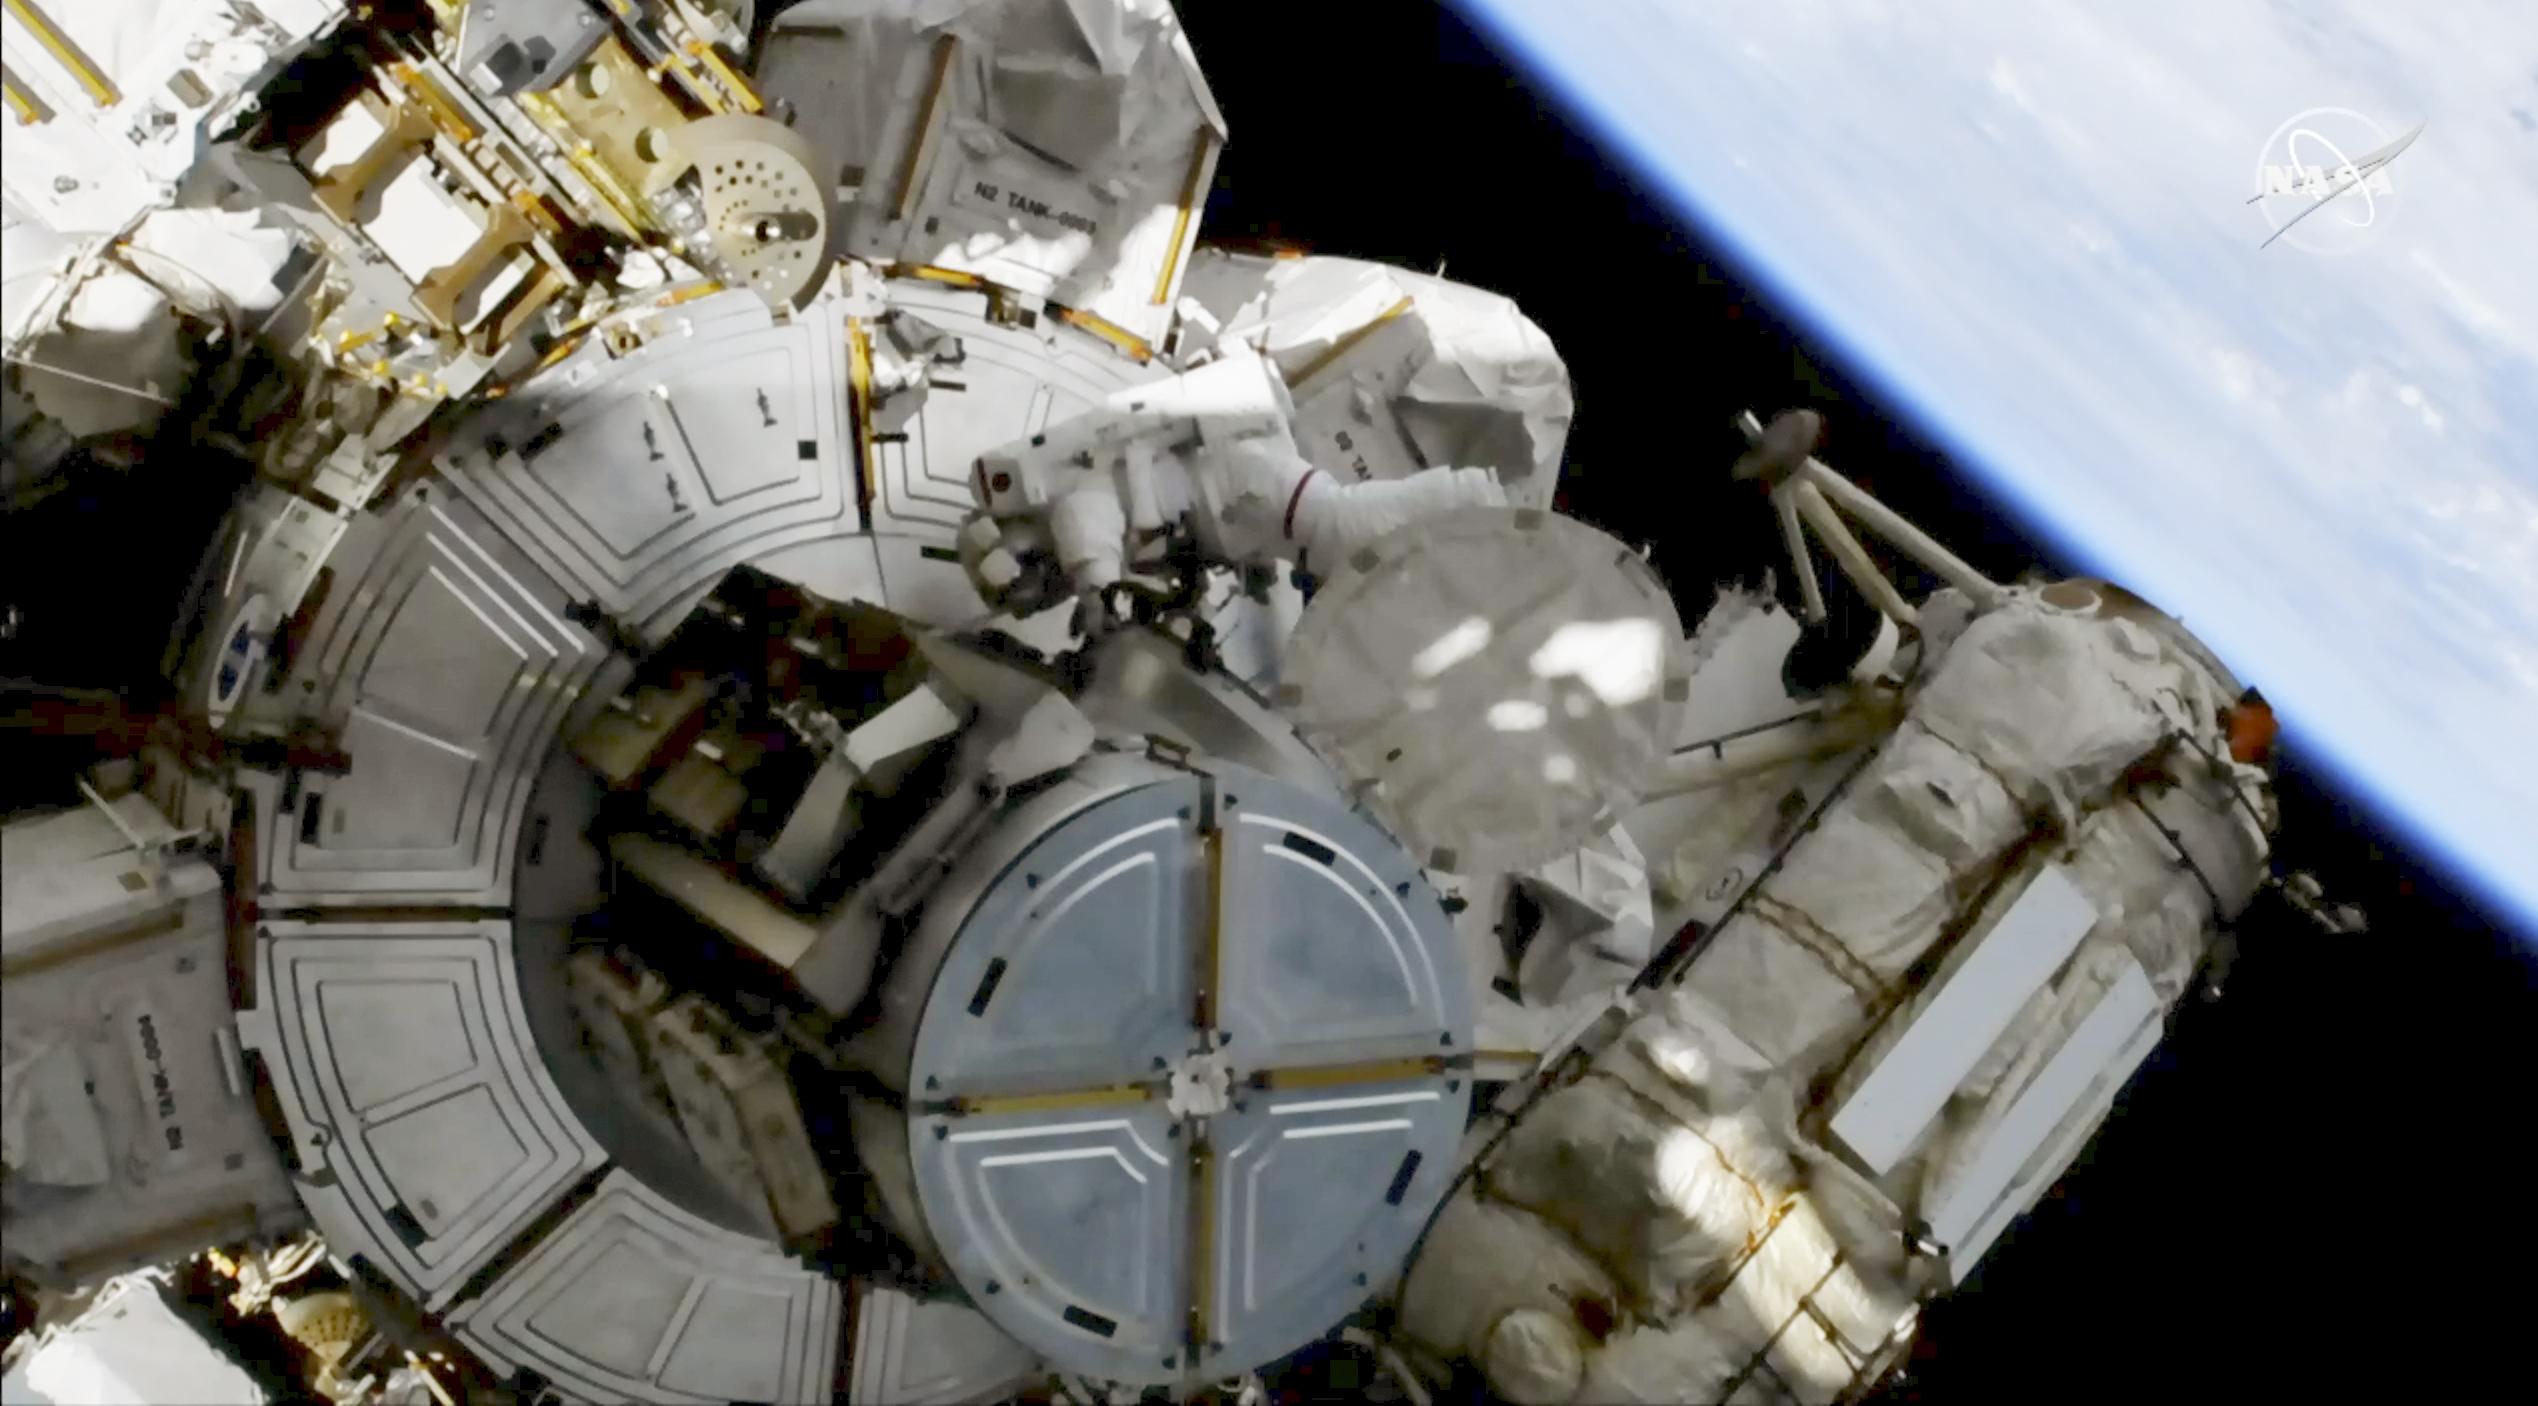 NASA conducts spacewalk as worlds 1st spacewalker dies